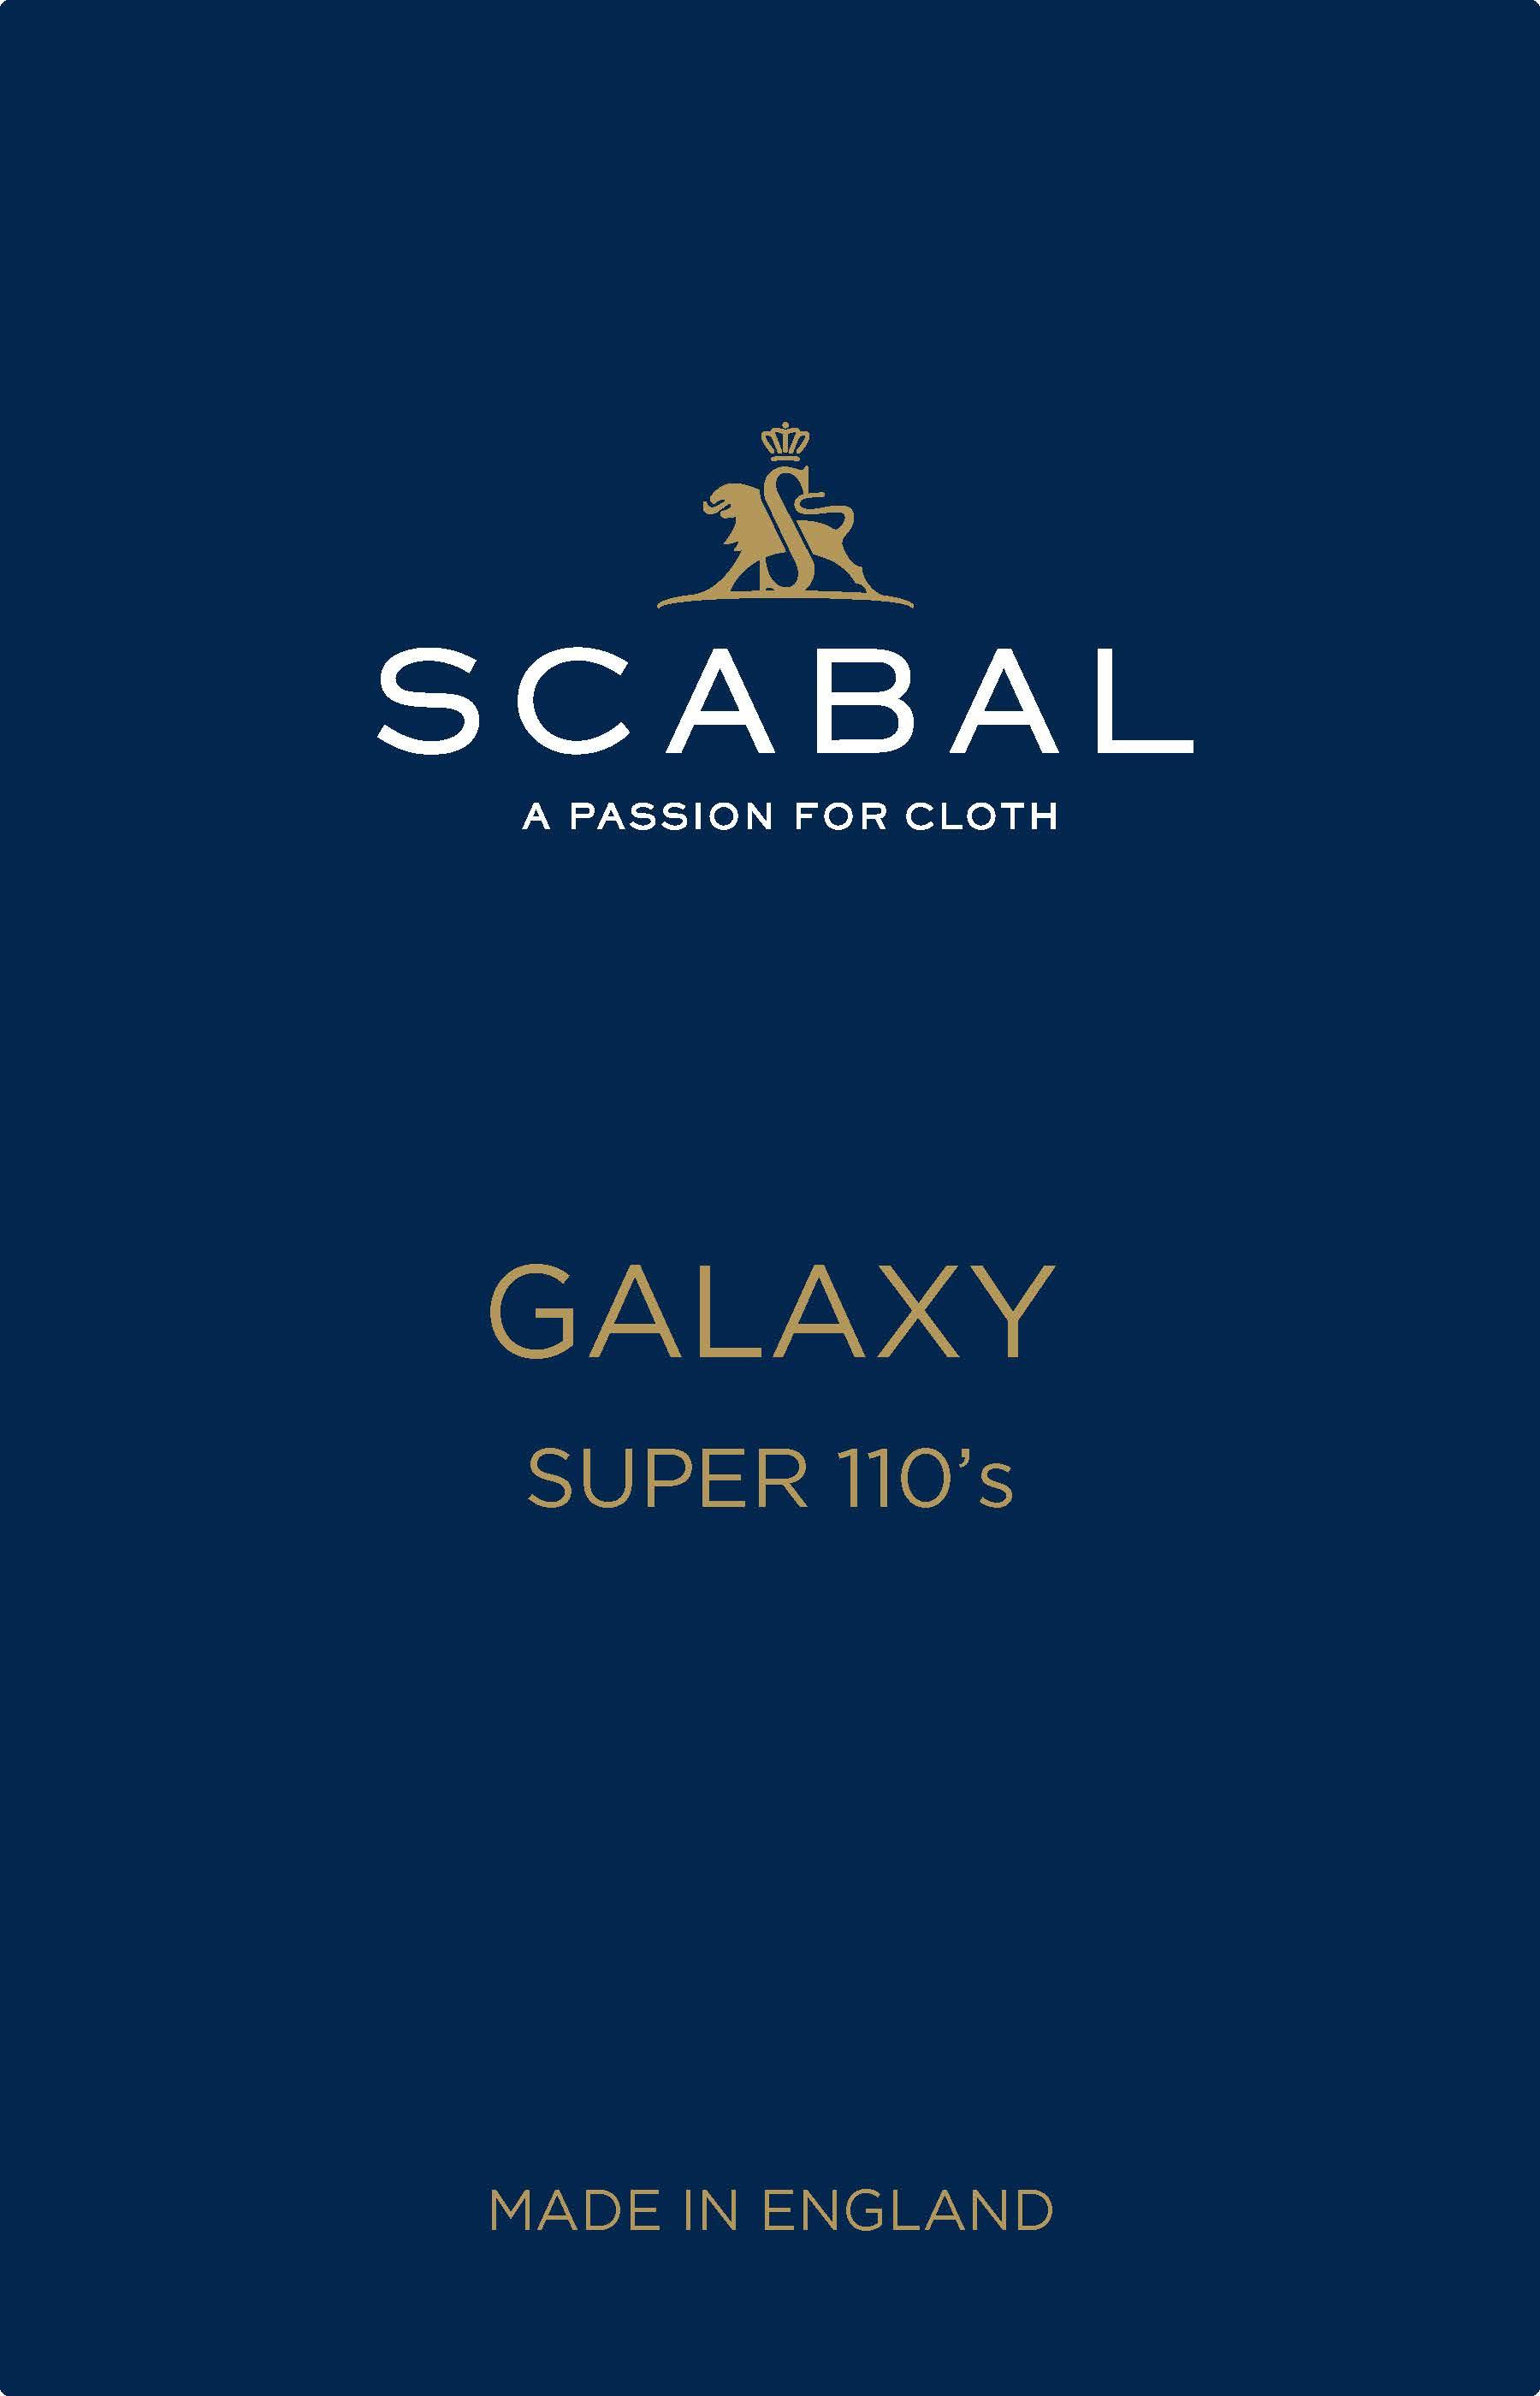 digital_collection_scabal_galaxy_19072.jpg